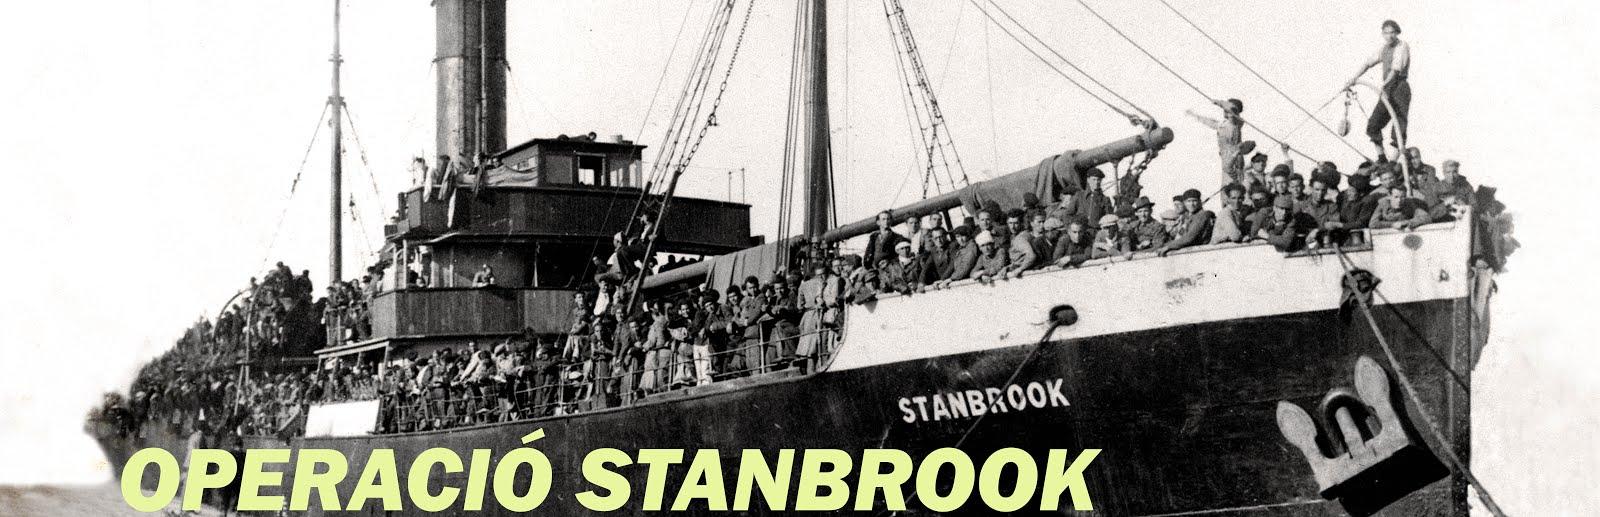 Operació Stanbrook